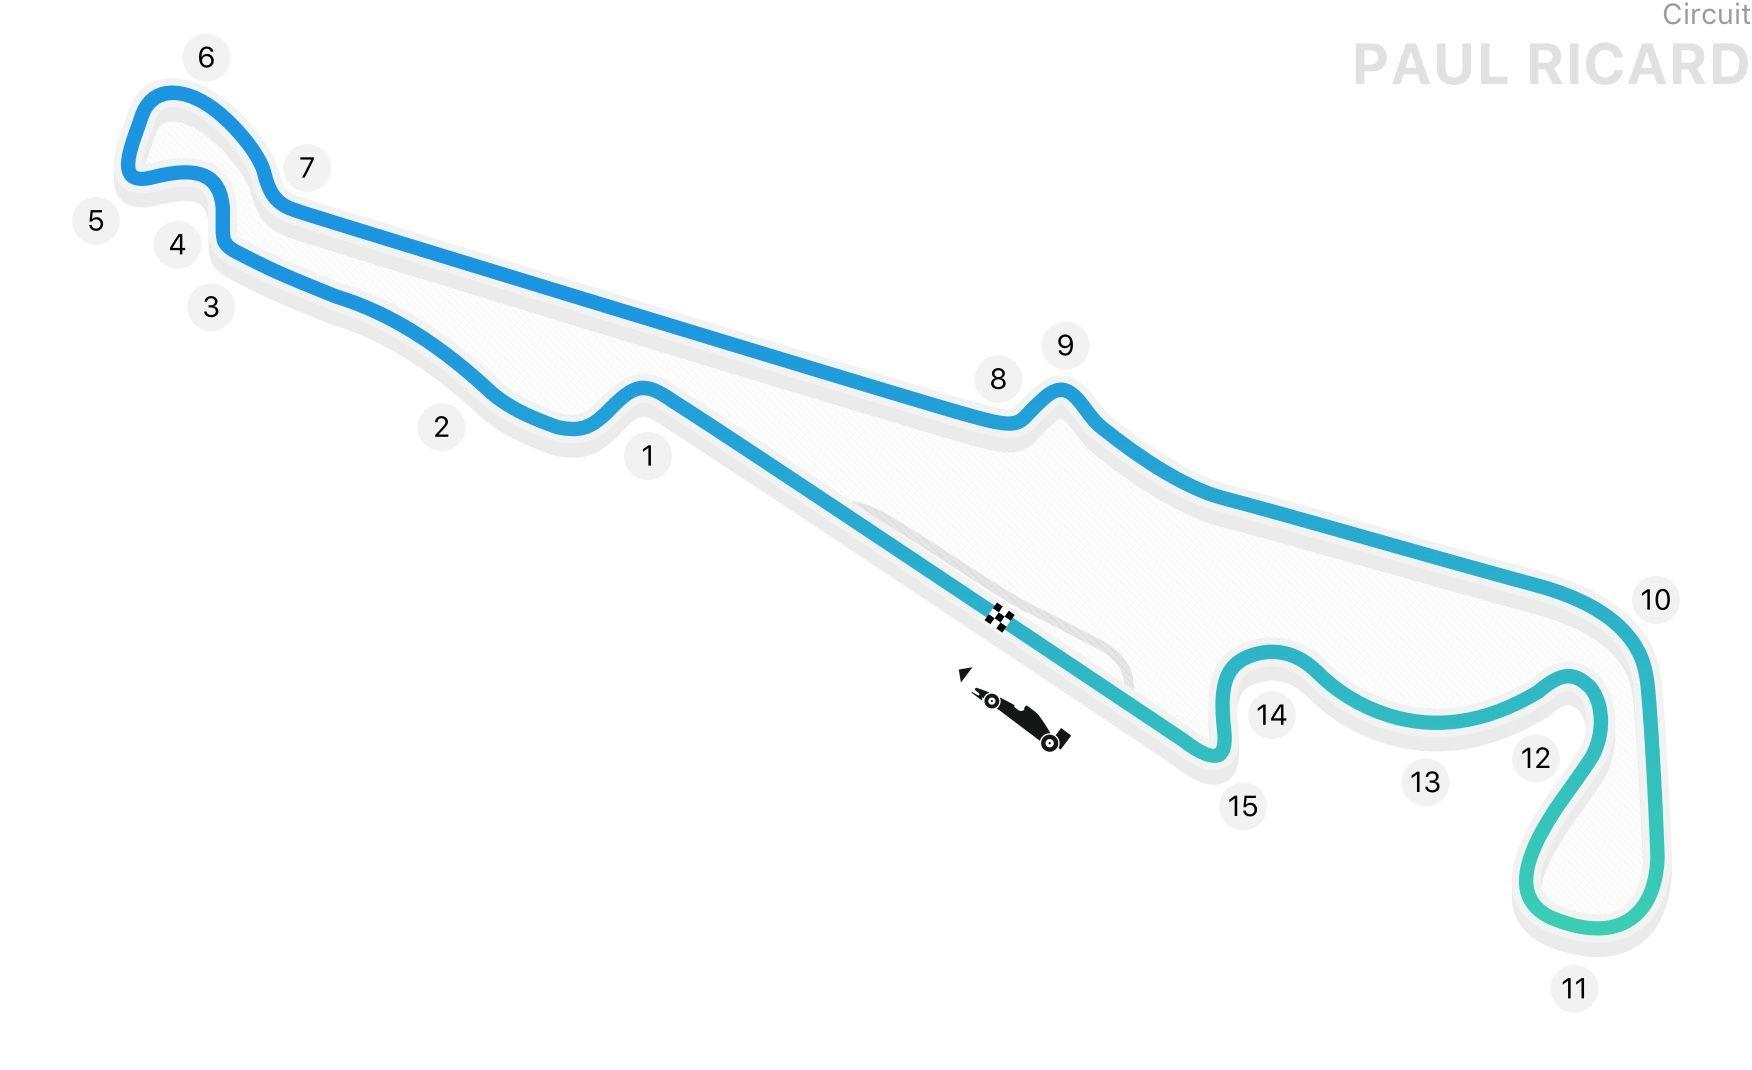 Circuit Paul Ricard